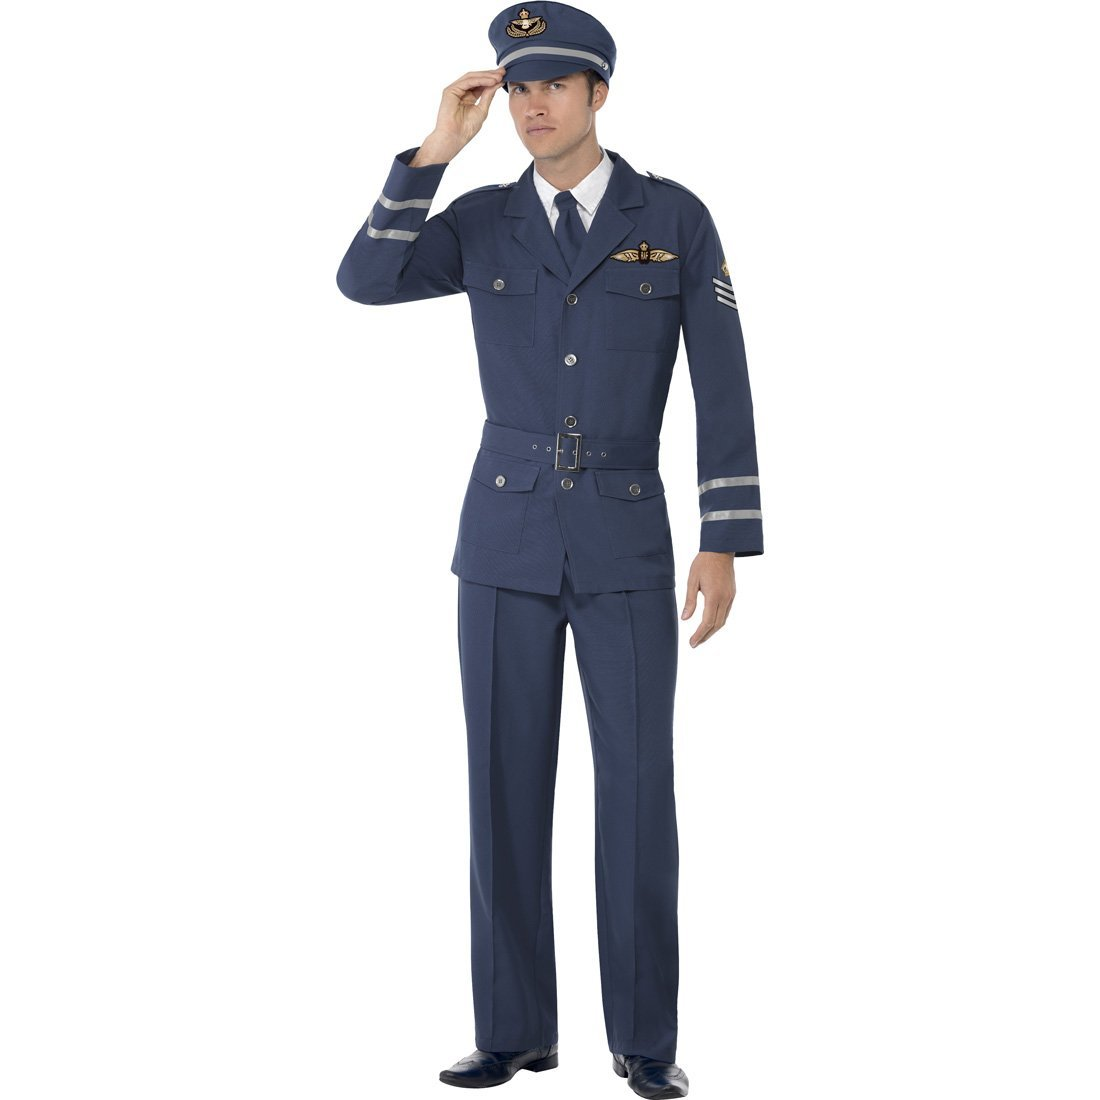 NET TOYS Pilota aereo aviatore Air Force abito uomo capitano maschera